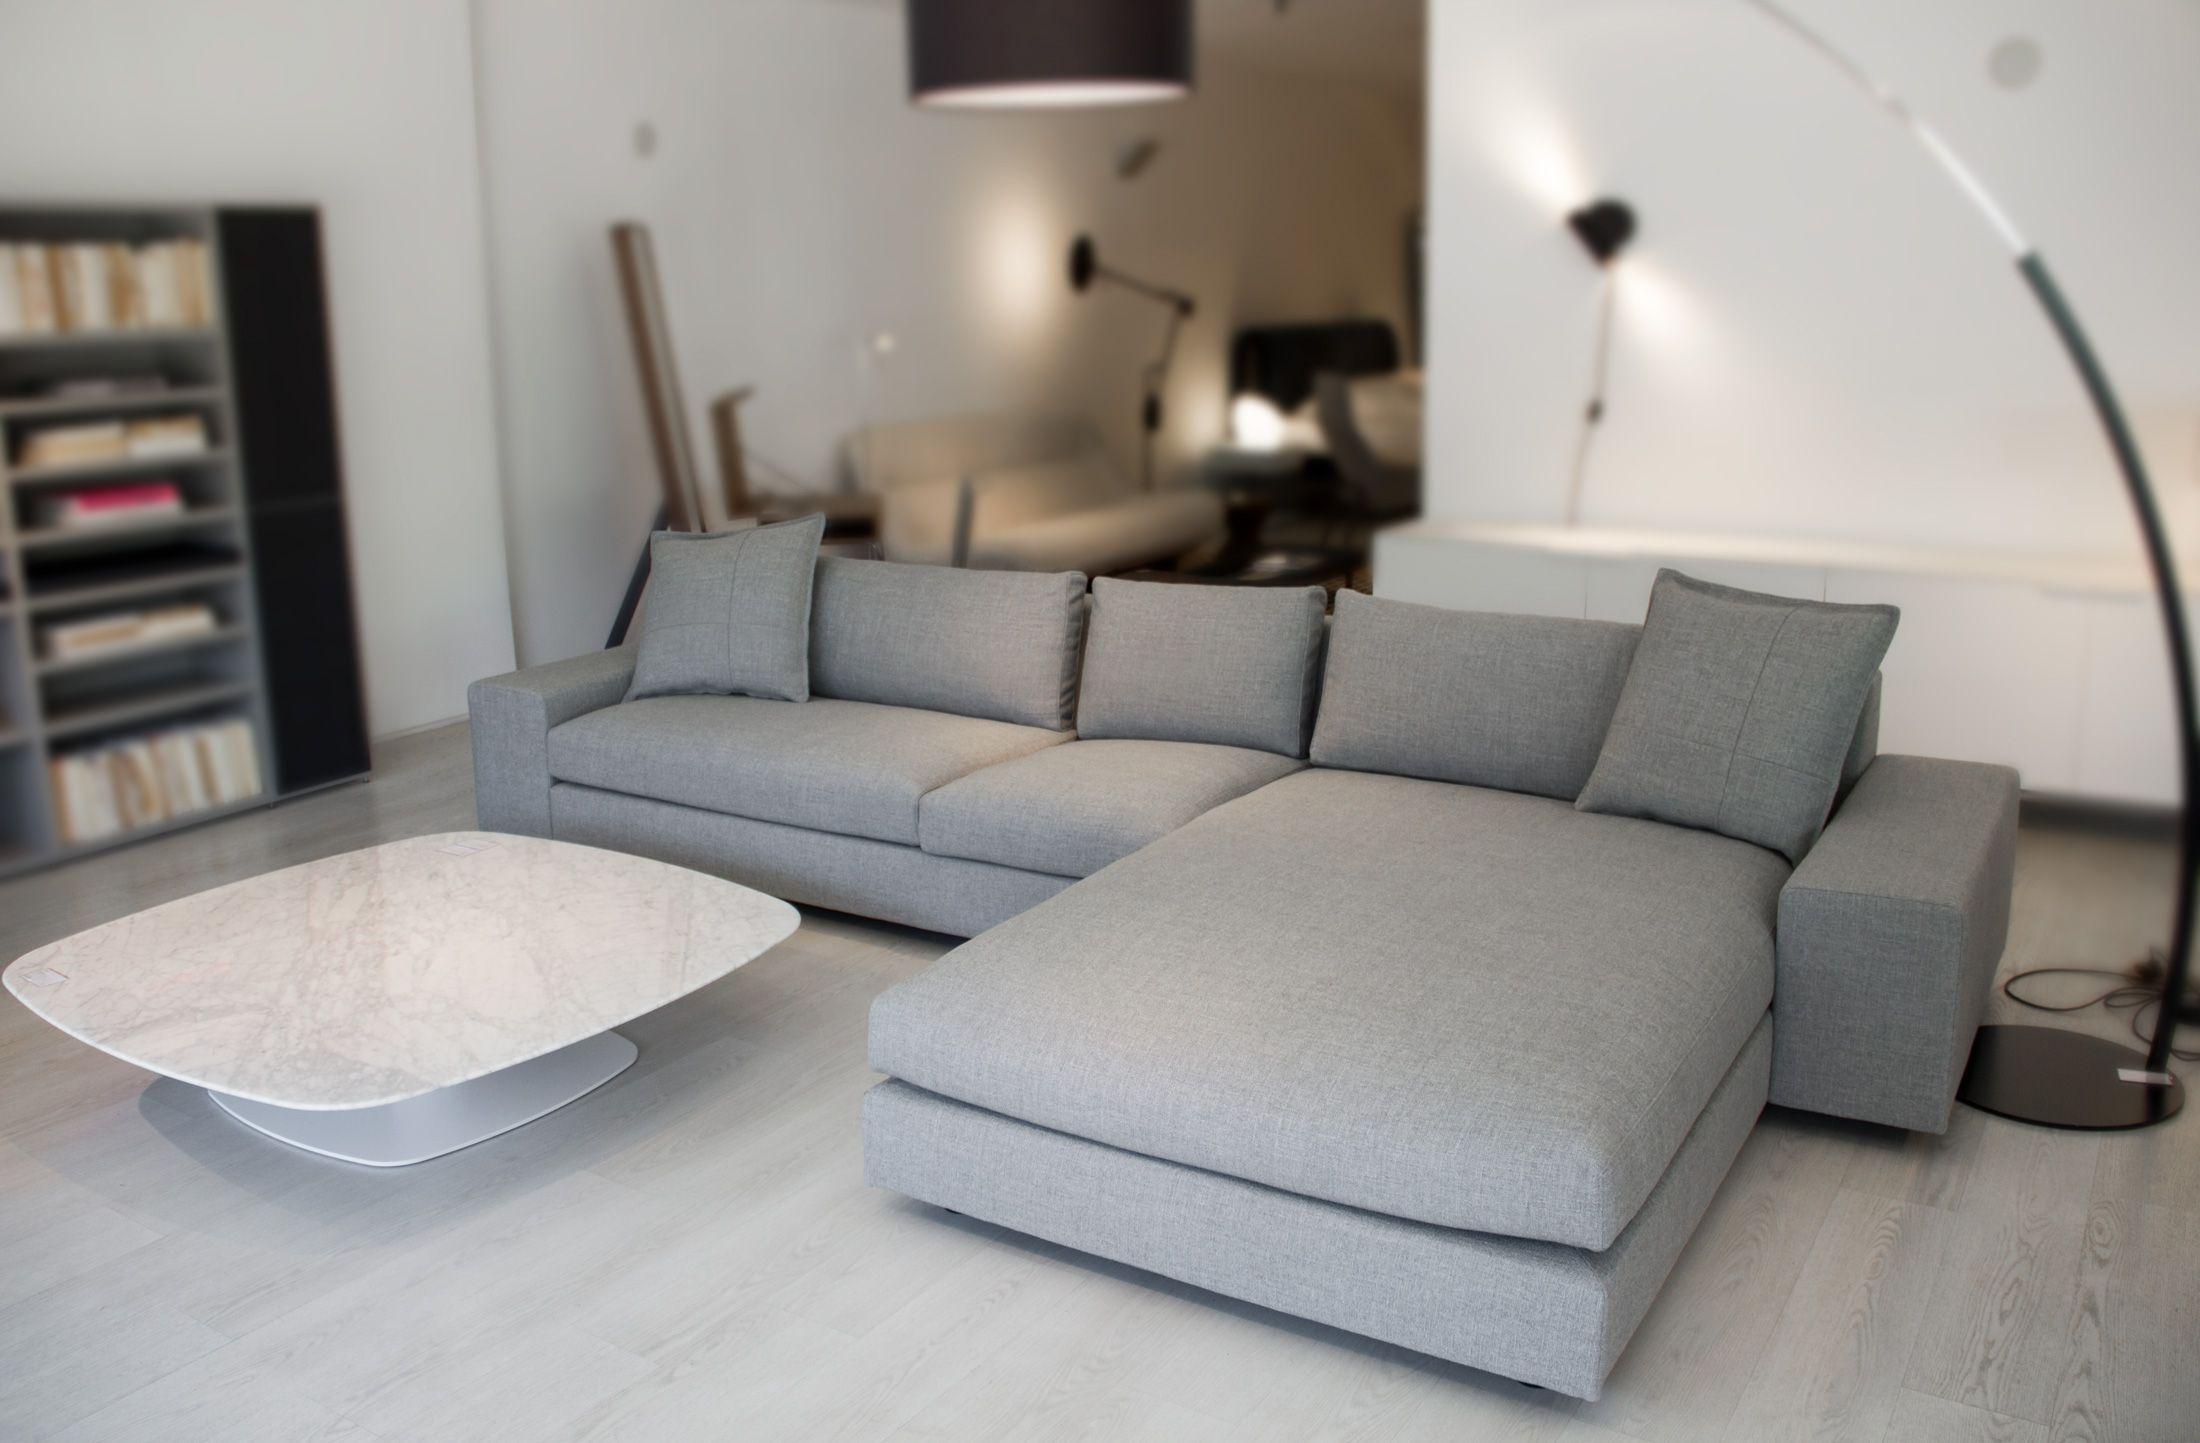 Exclusif In Showroom Modern Sofa Sectional Sofa Modern Seating